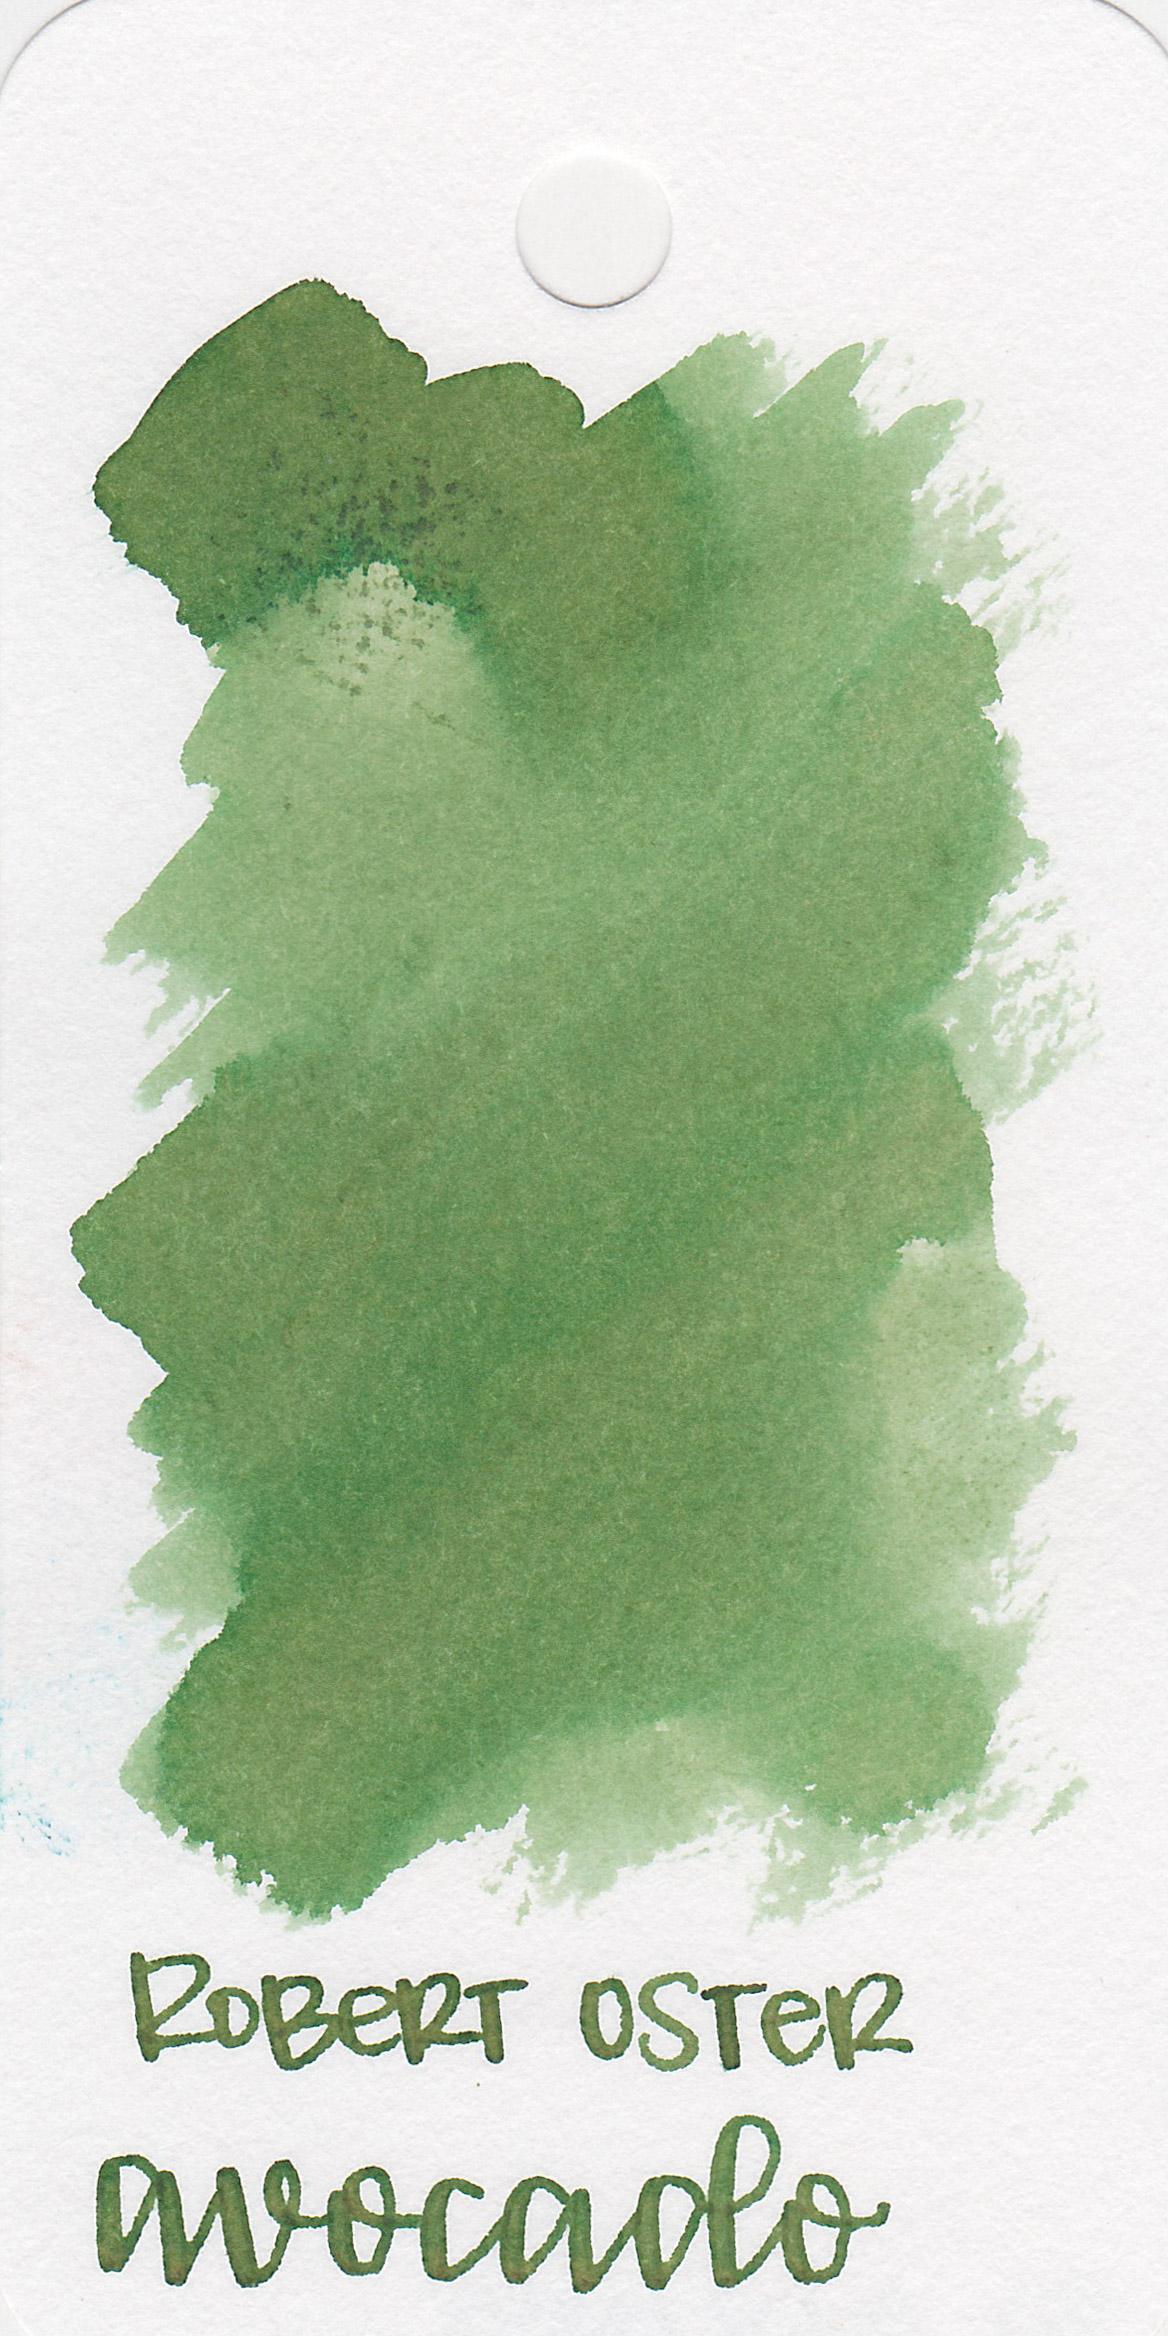 ro-avocado-1.jpg